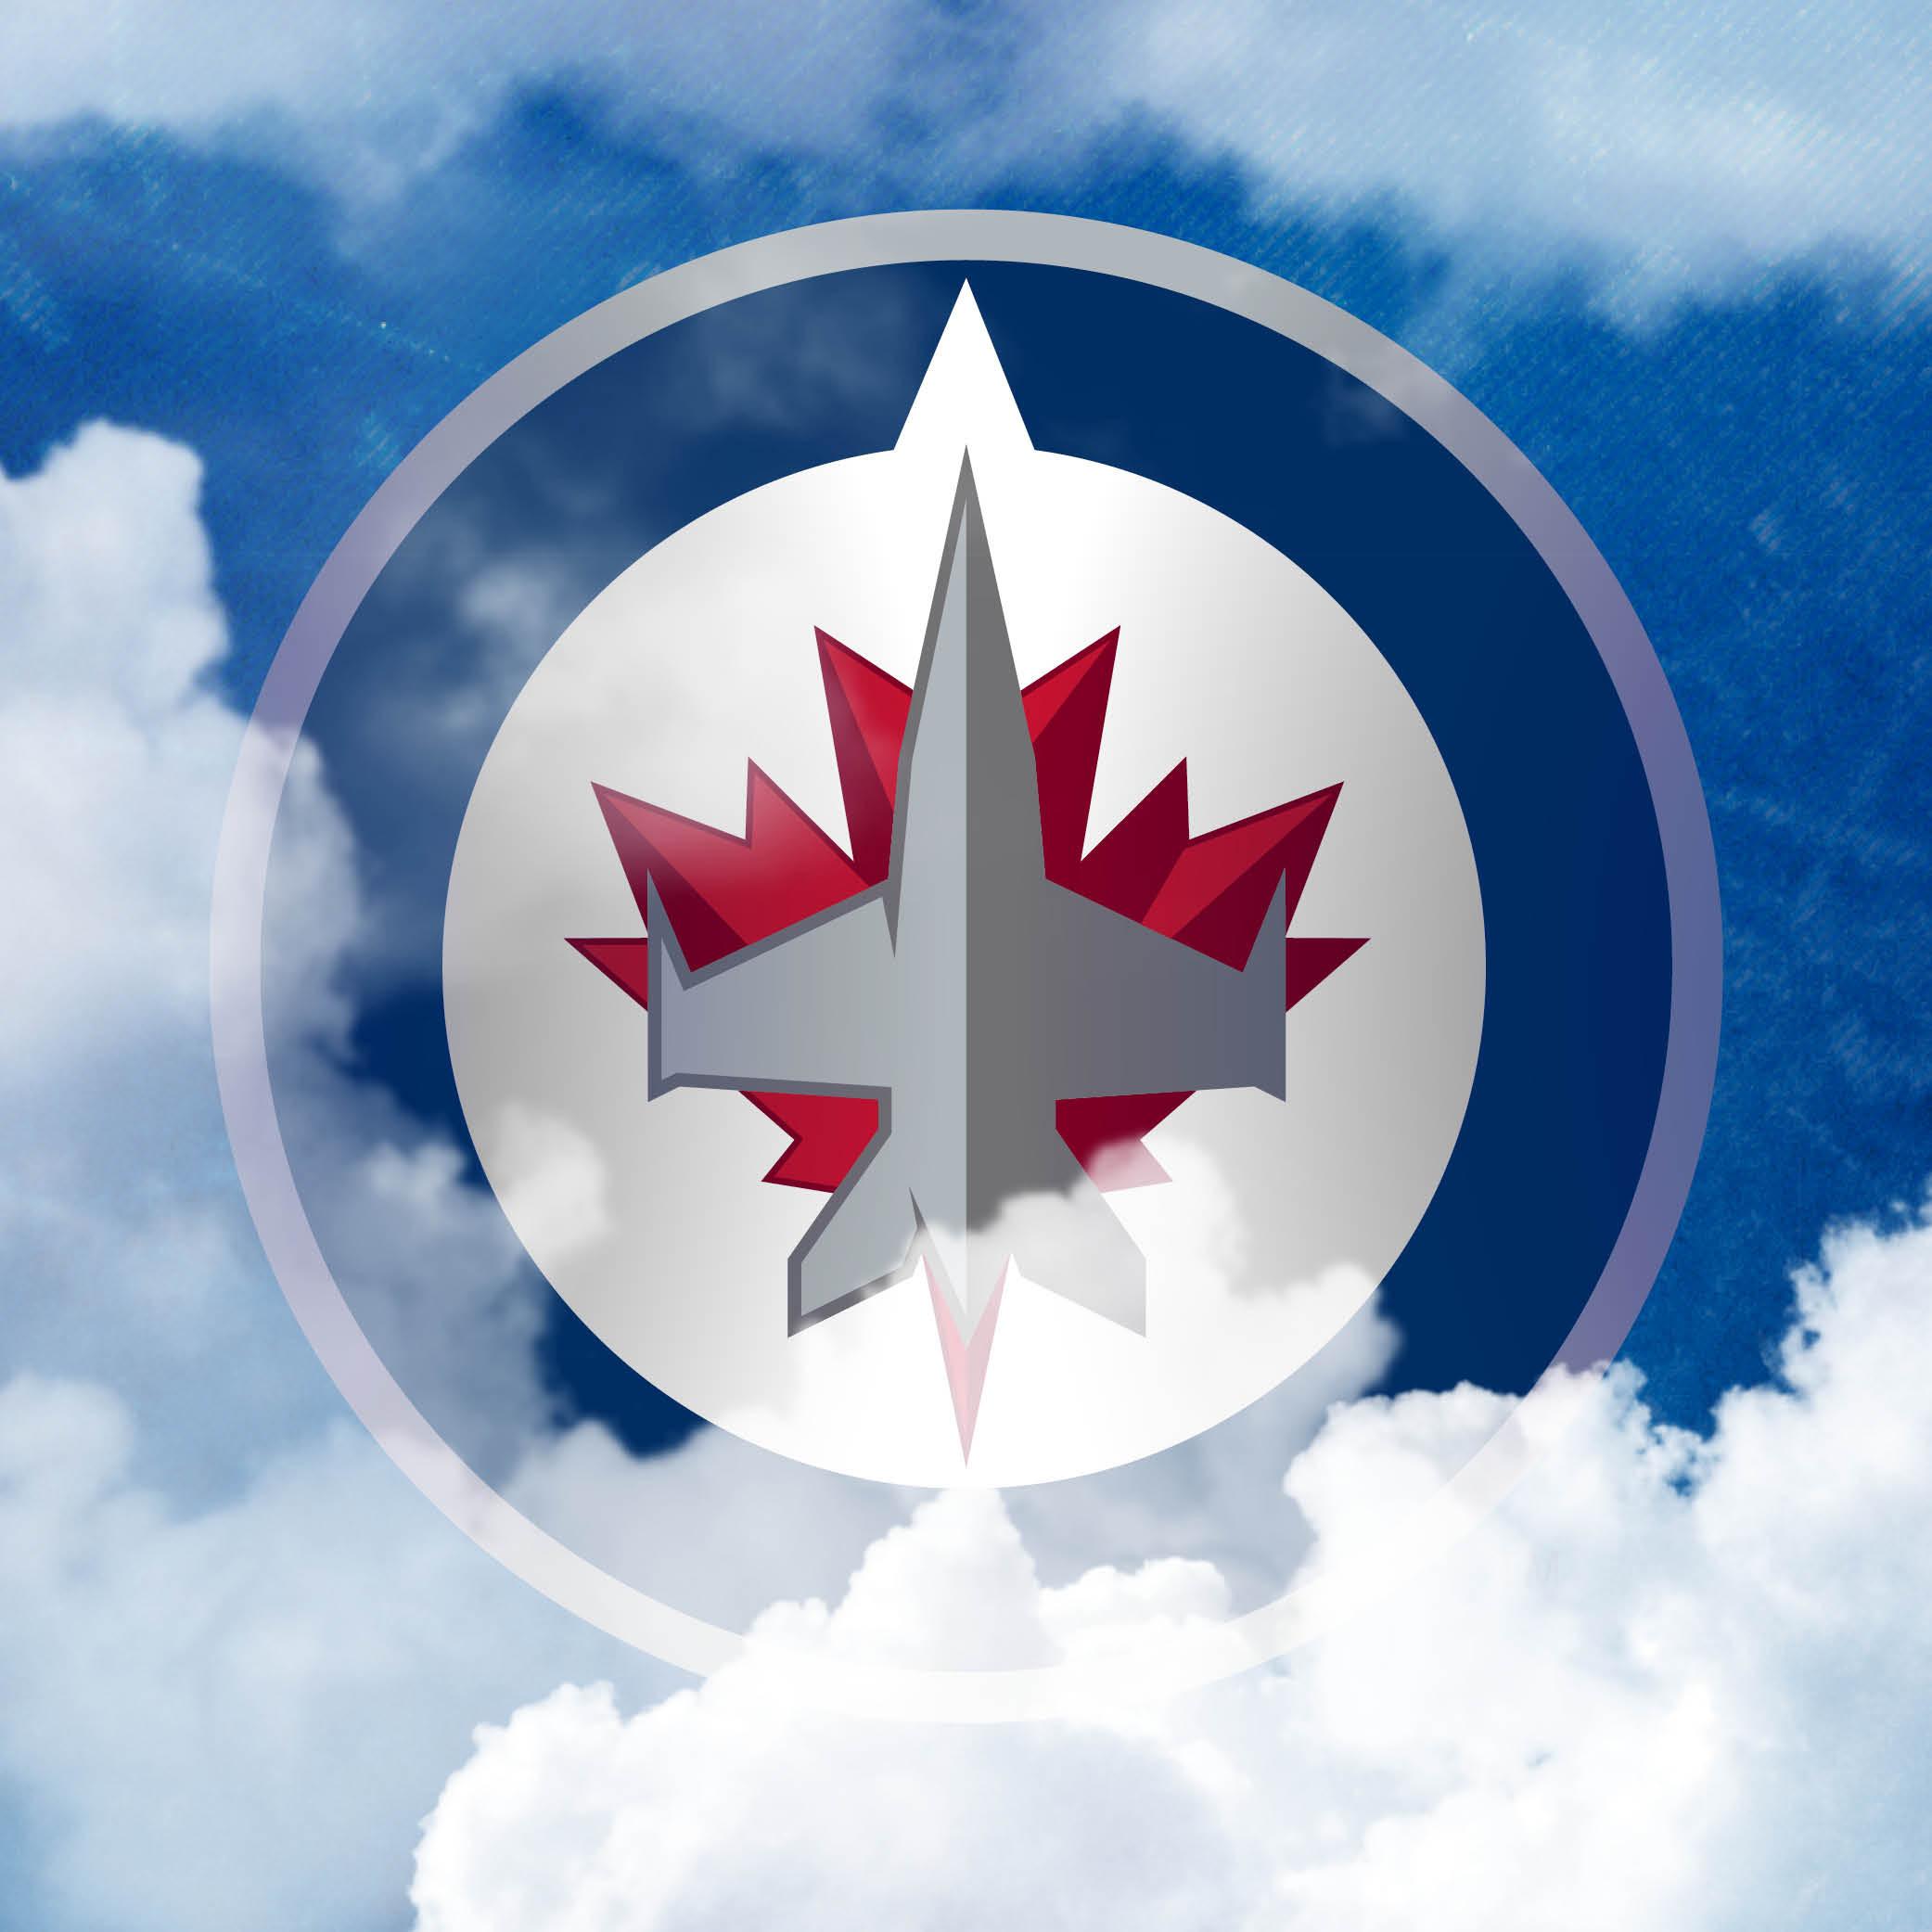 Download Winnipeg Jets Wallpapers Good Pictures of Winnipeg Jets 2083x2083